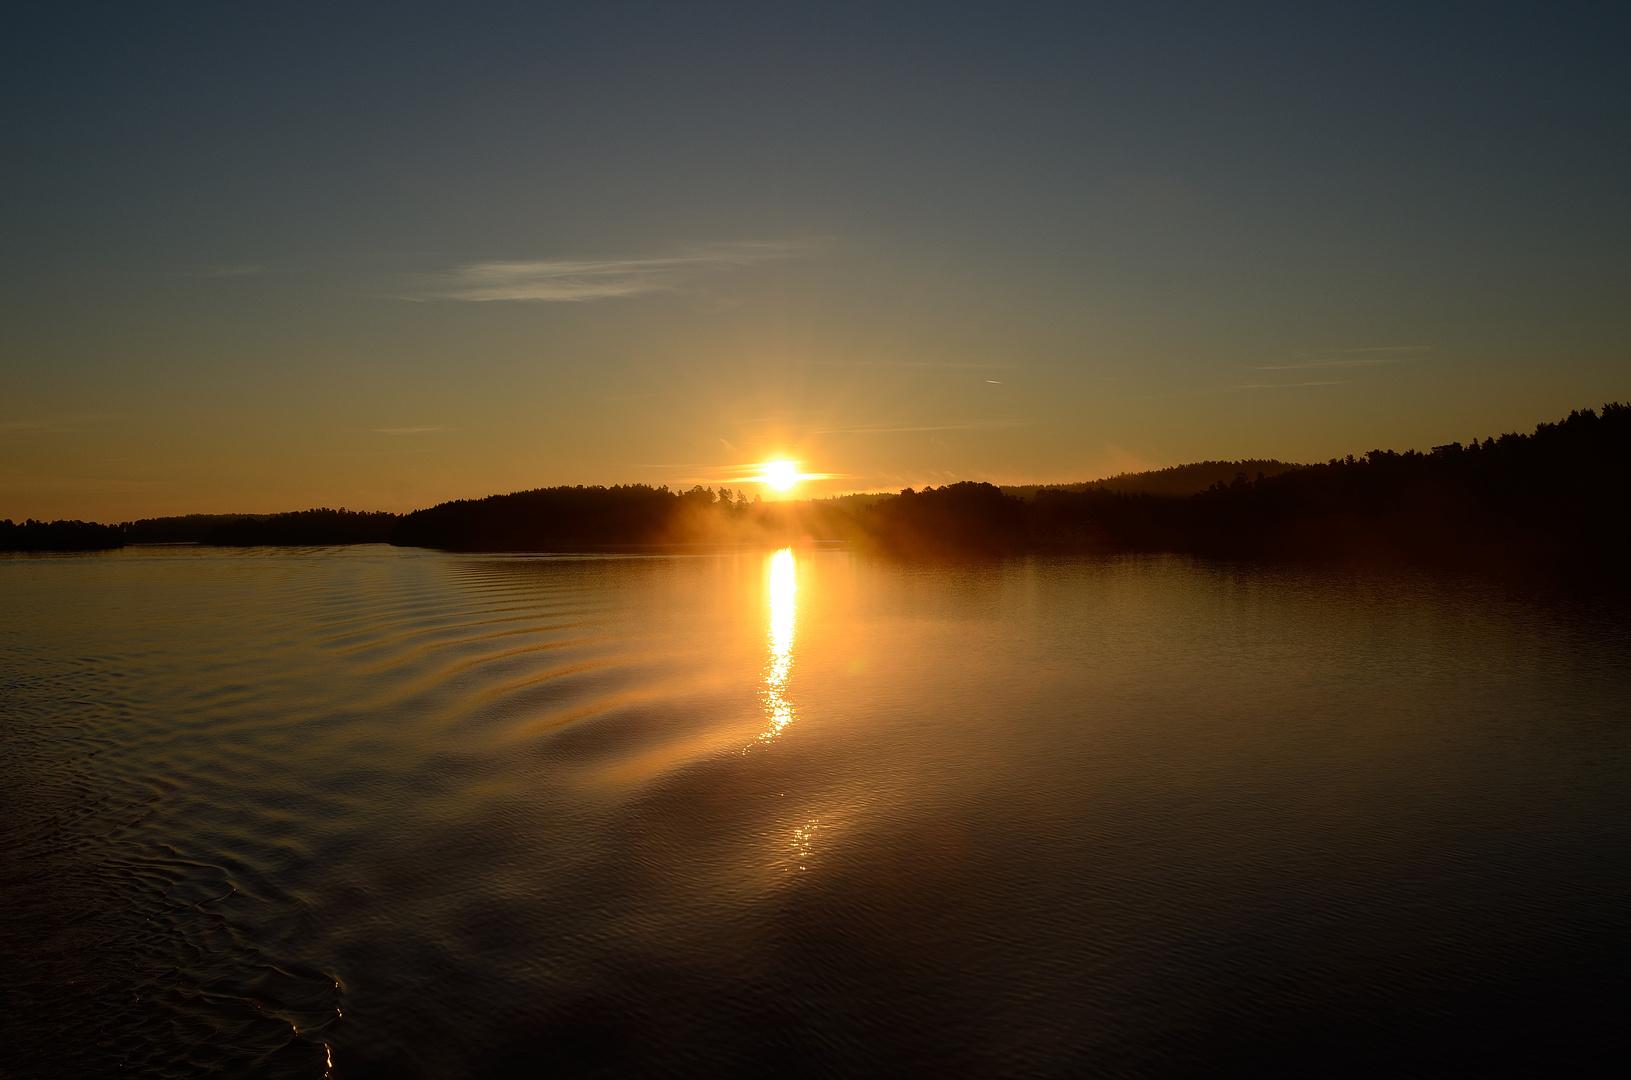 Sonnenaufgang in den Schären